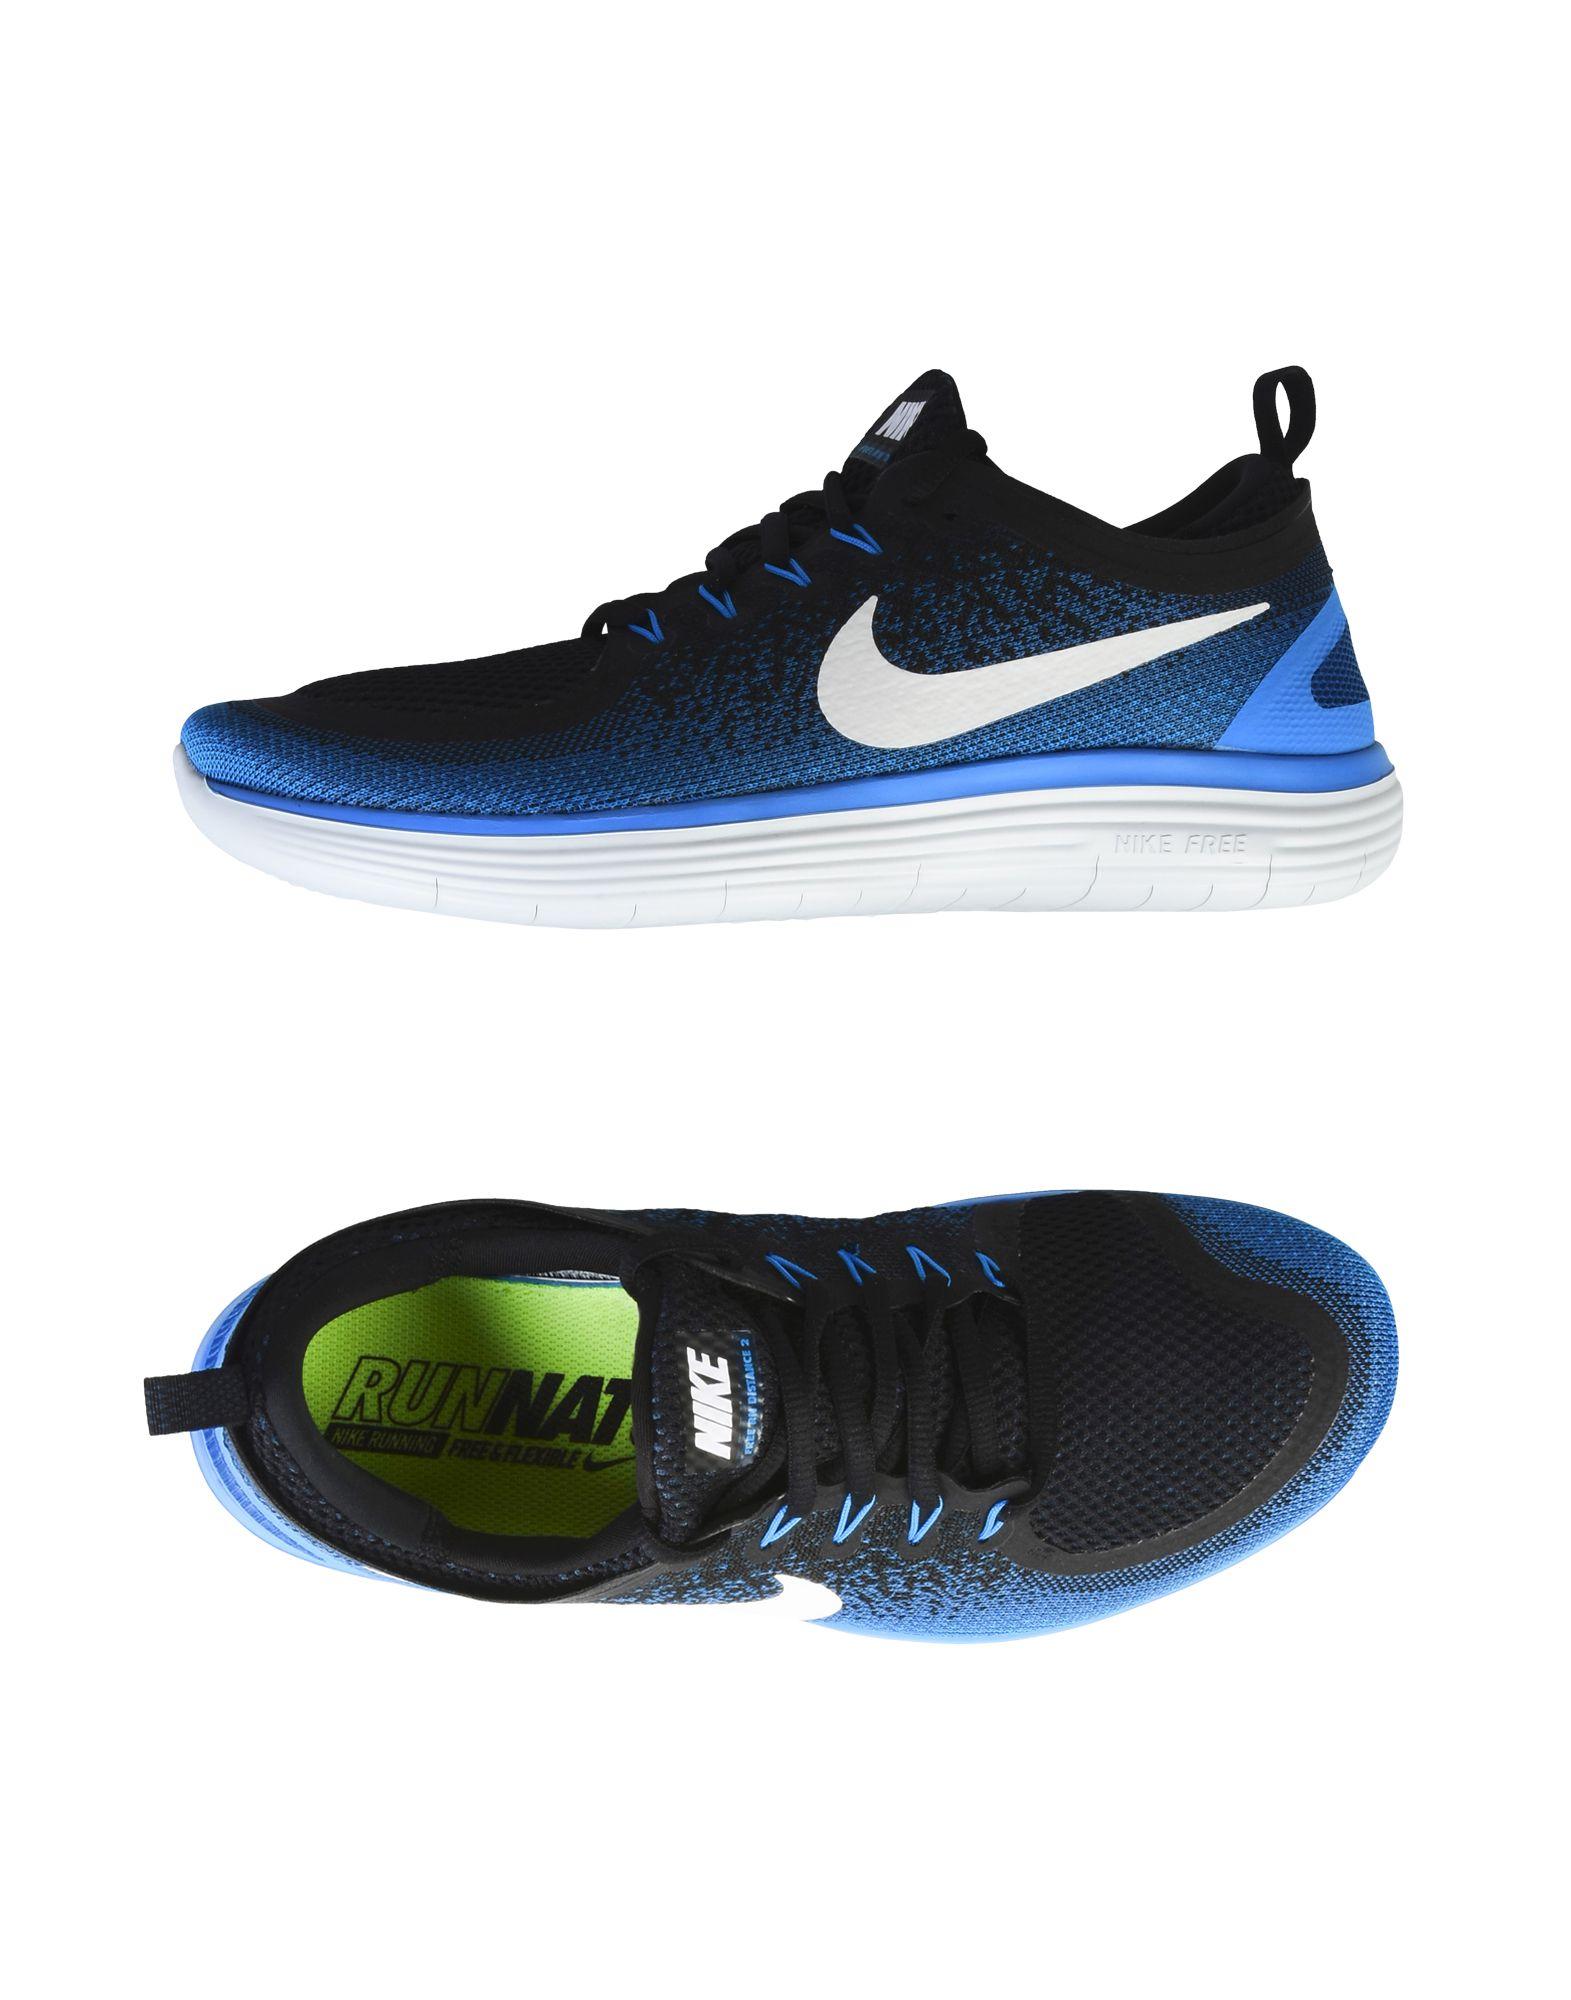 NIKE Herren Low Sneakers & Tennisschuhe Farbe Schwarz Größe 8 jetztbilligerkaufen